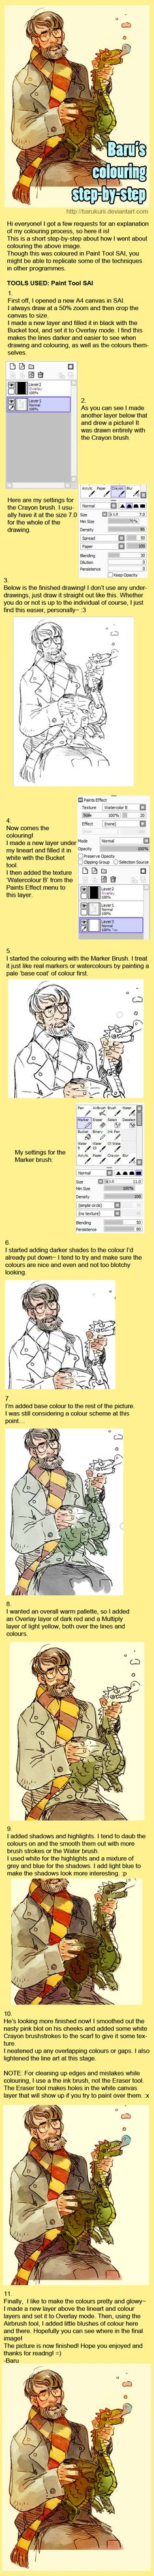 Colouring step by step by *Barukurii [dA]